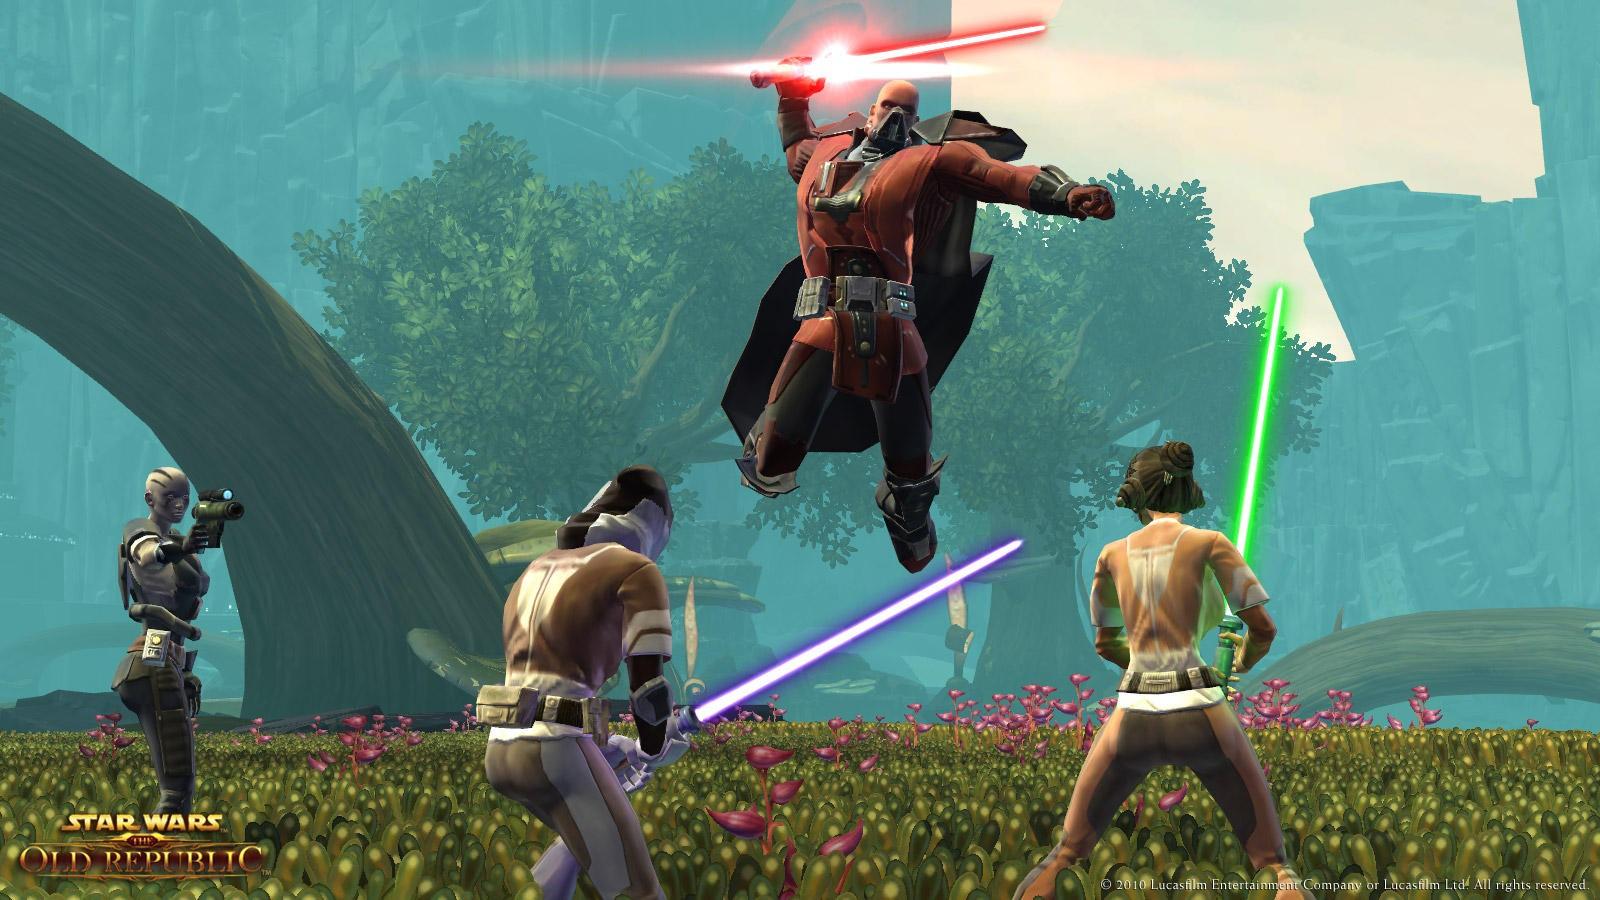 Star Wars: The Old Republic - Spade Laser